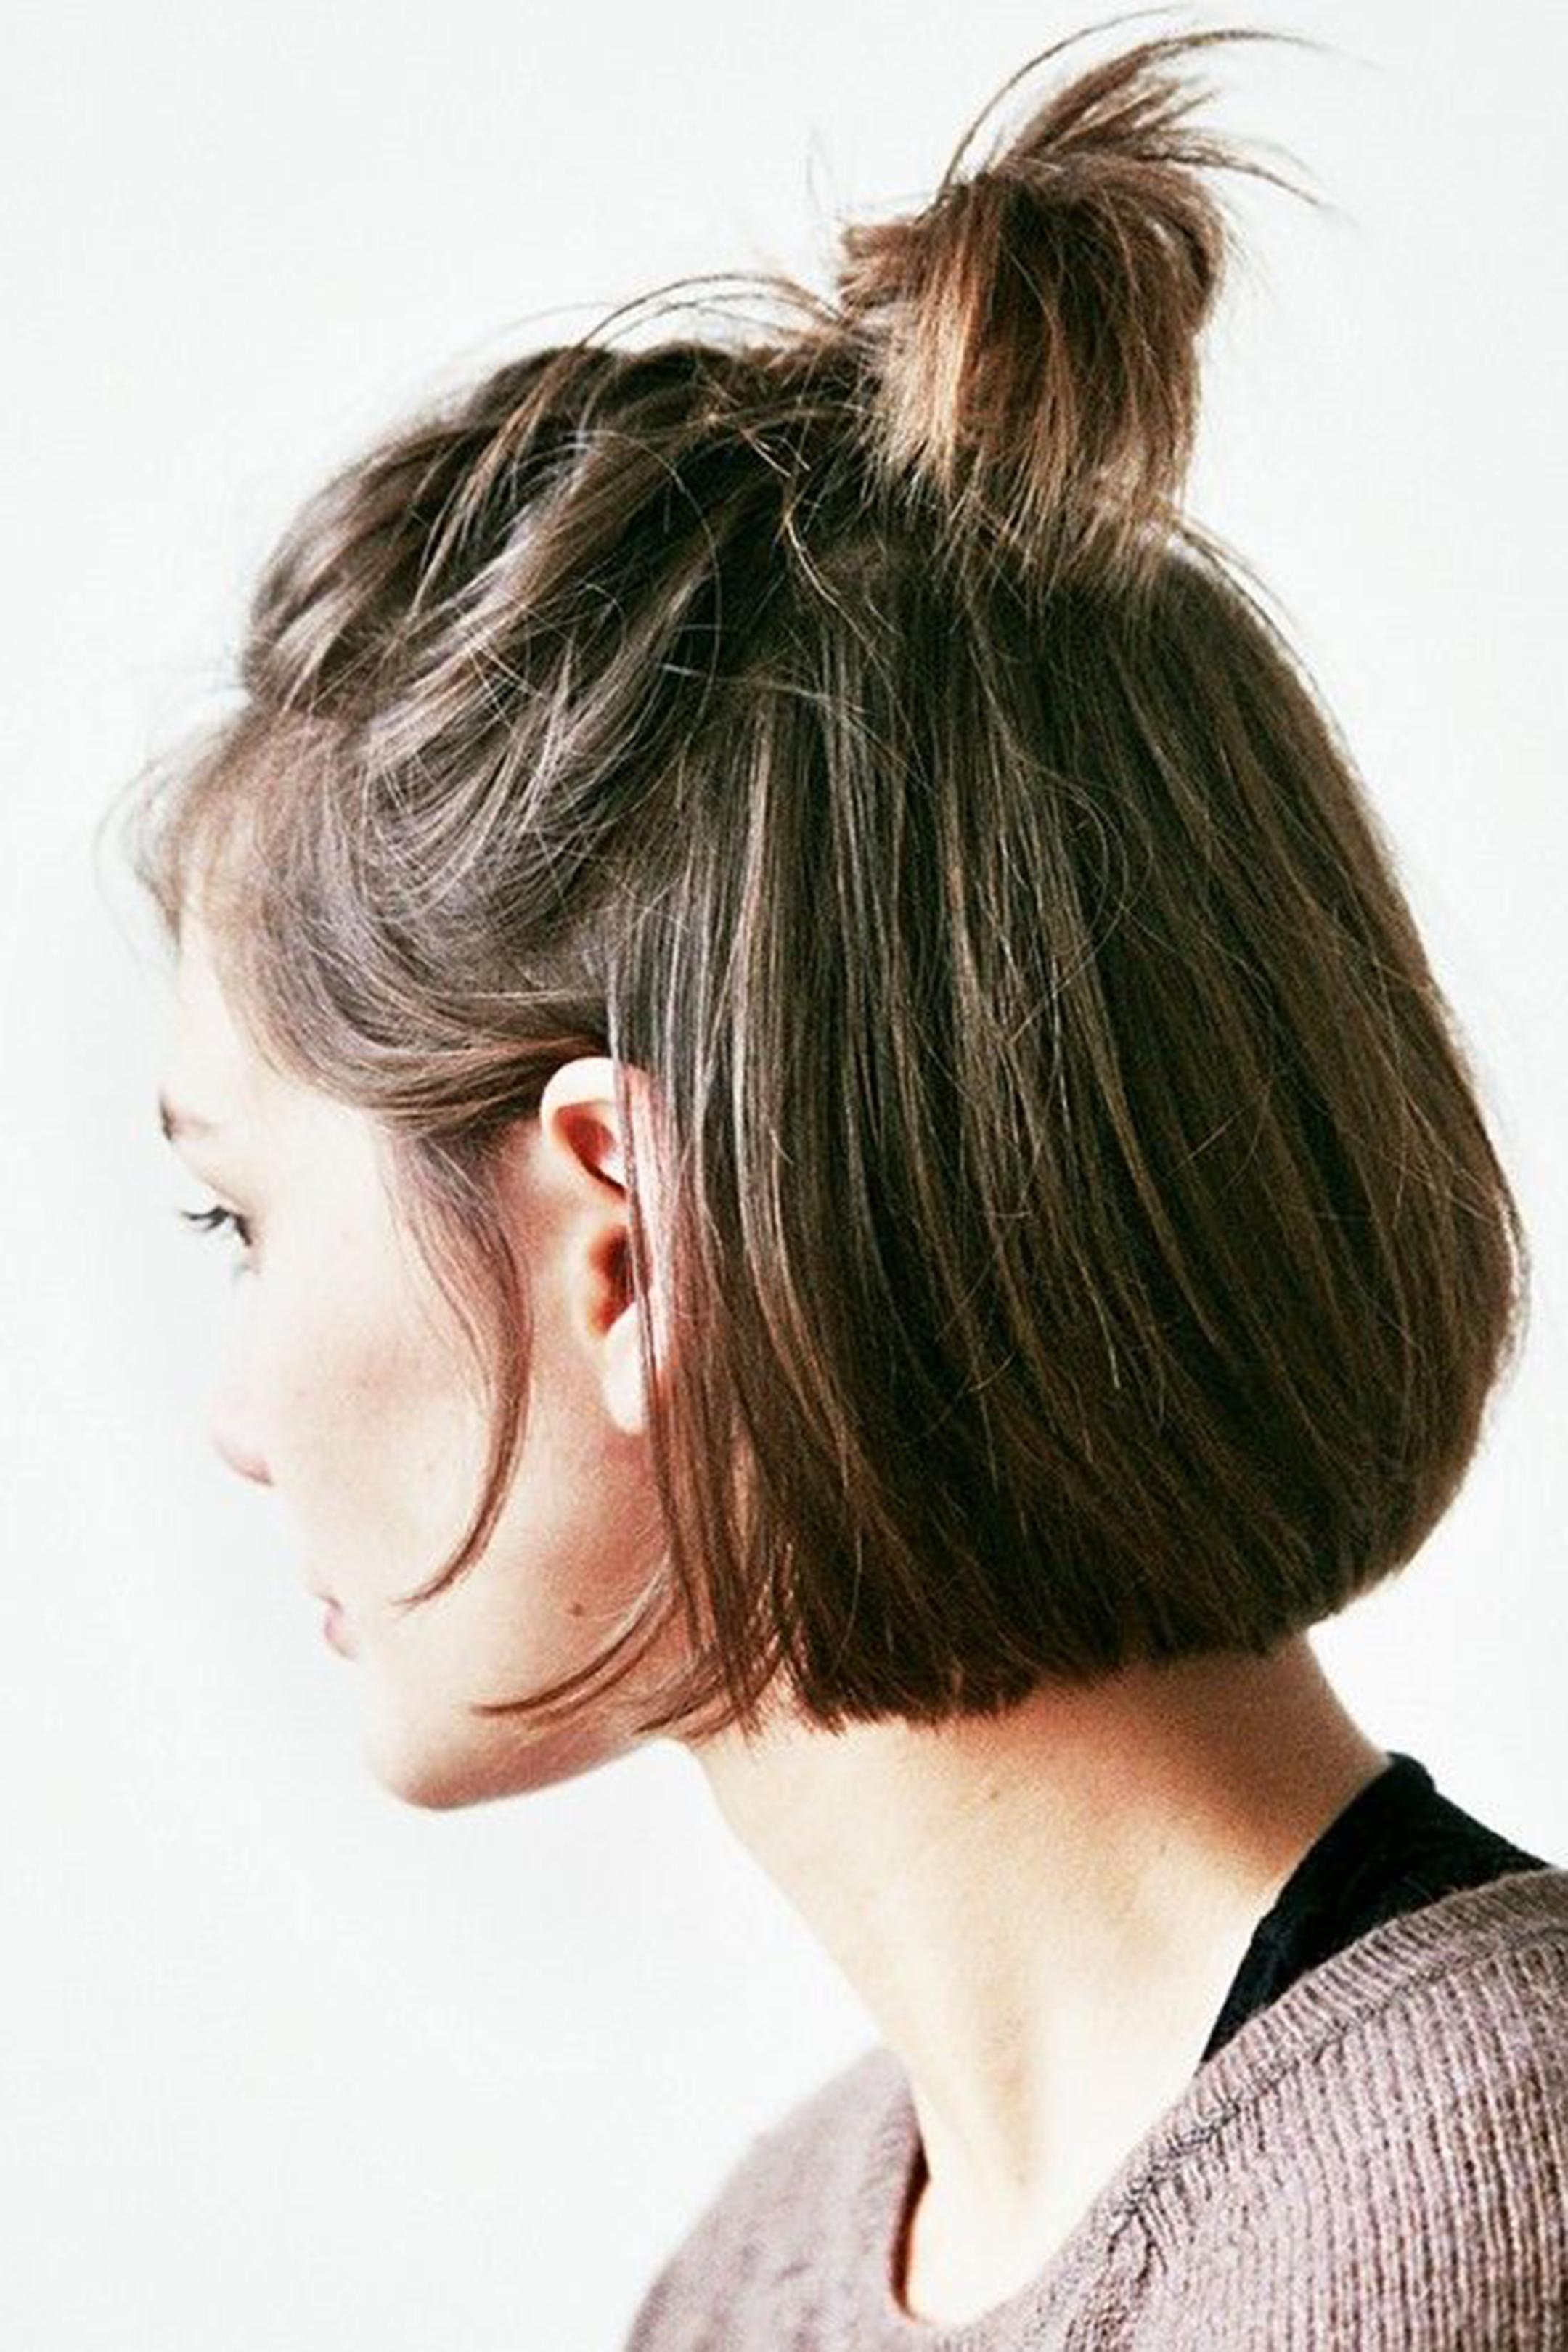 rihanna-alessia-canella-halfbun-capelli-tendenza-hair-trend-olsen-tendenze-emily-ratajowskji-star